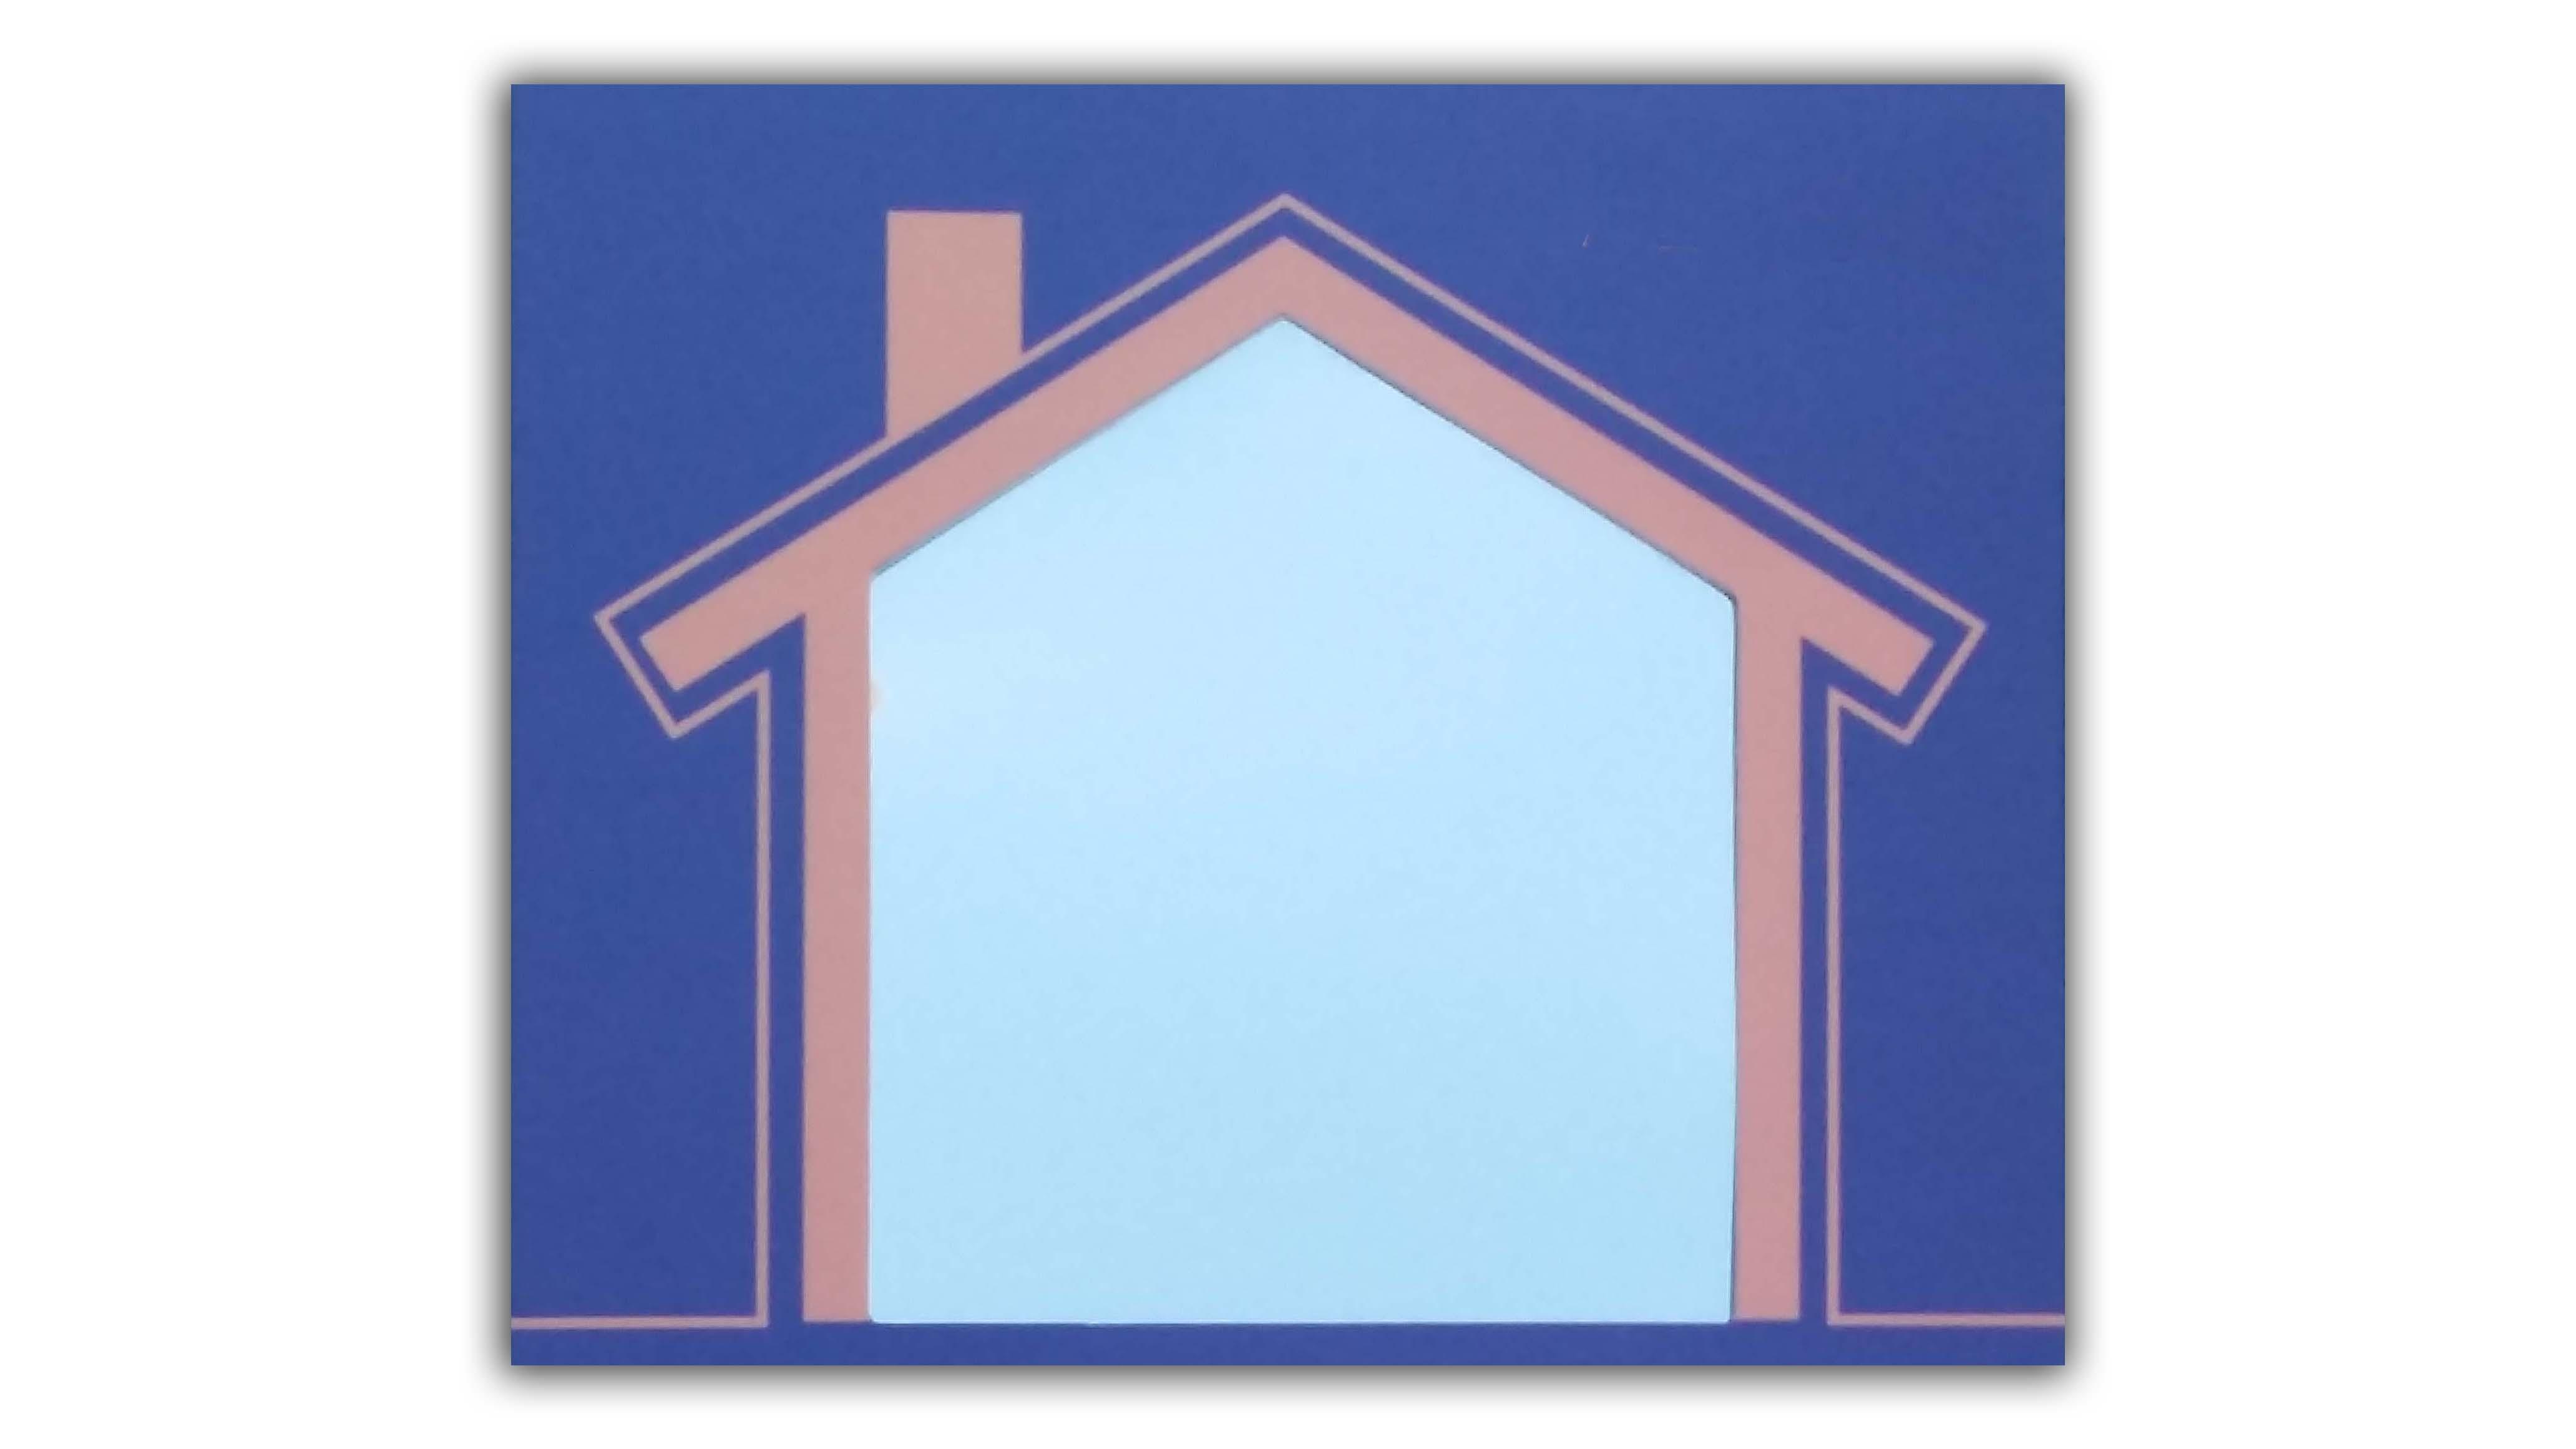 Venta pintura online: MIRROR  (30,5m x 1,52m)